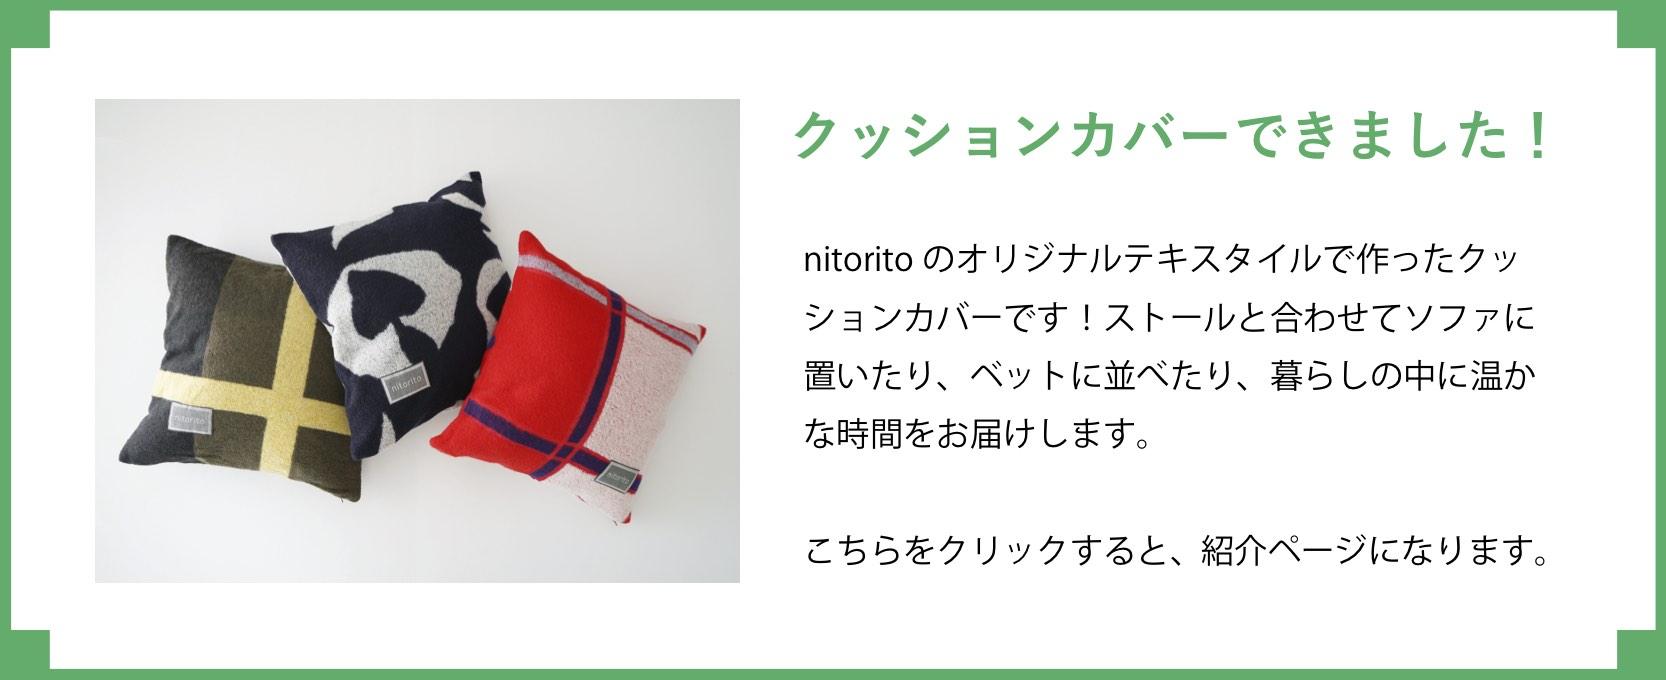 nitorito cushion cover